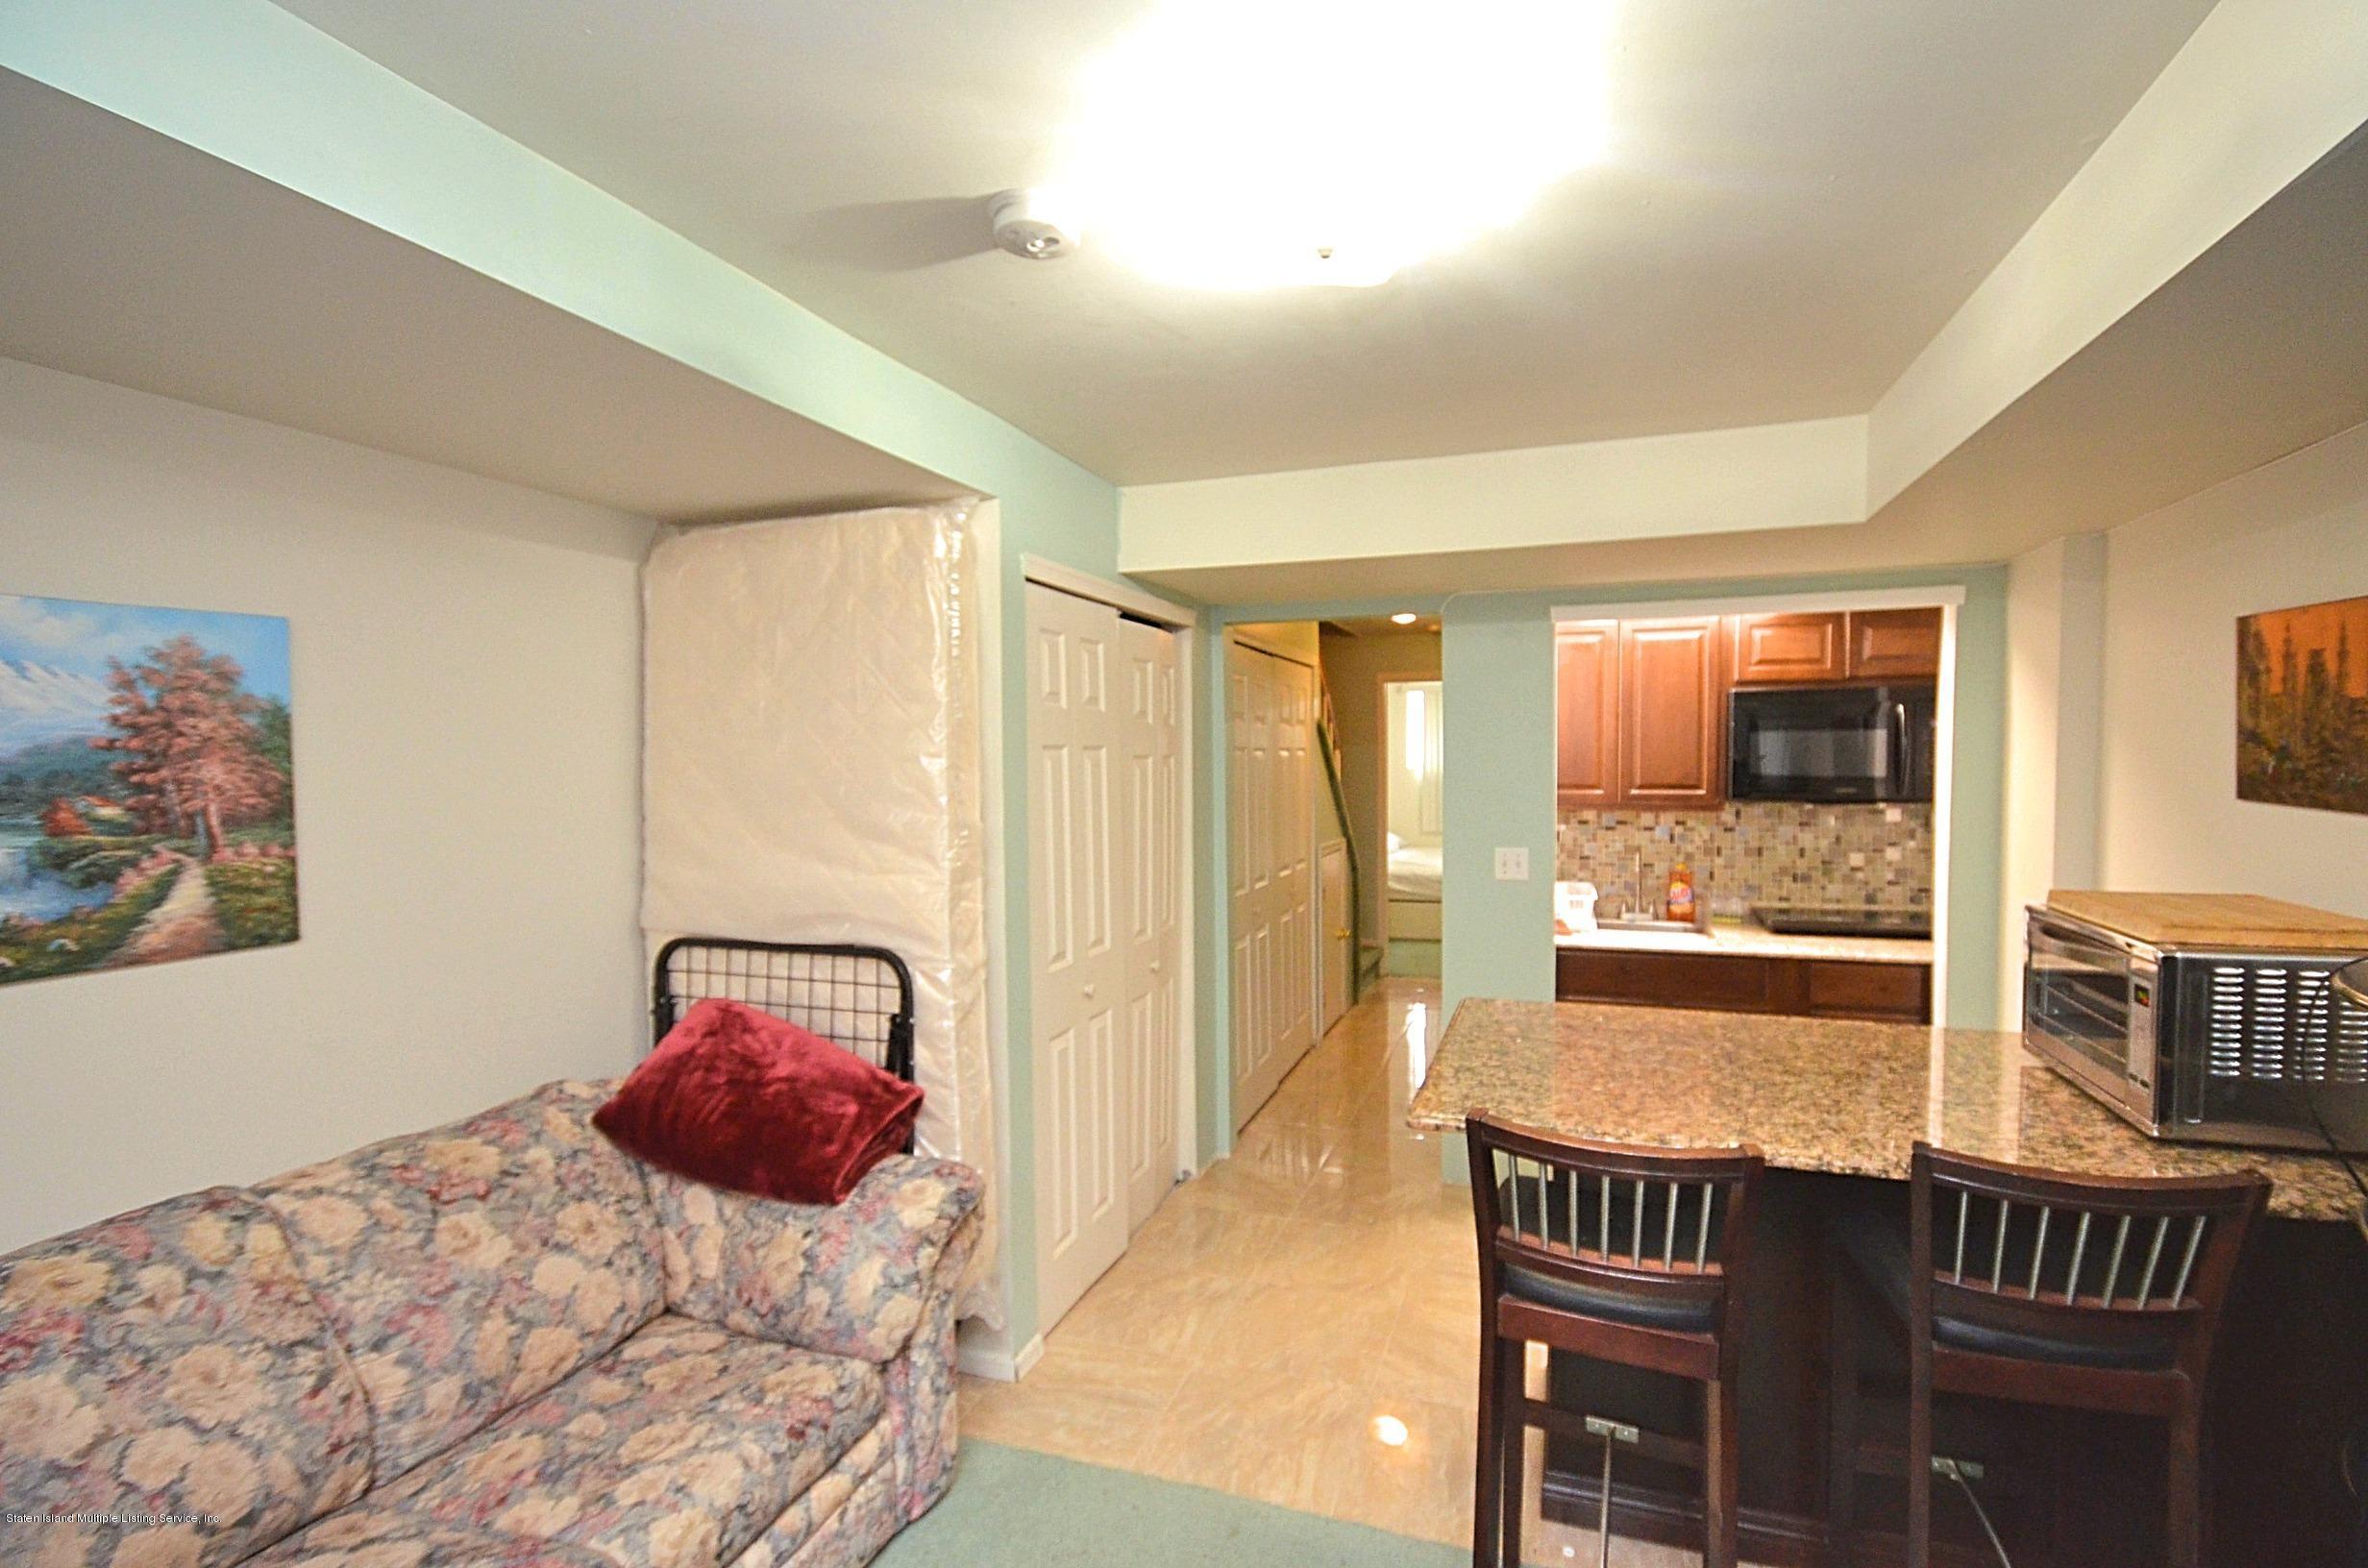 Single Family - Attached 200 Kenilworth Avenue  Staten Island, NY 10312, MLS-1124636-8